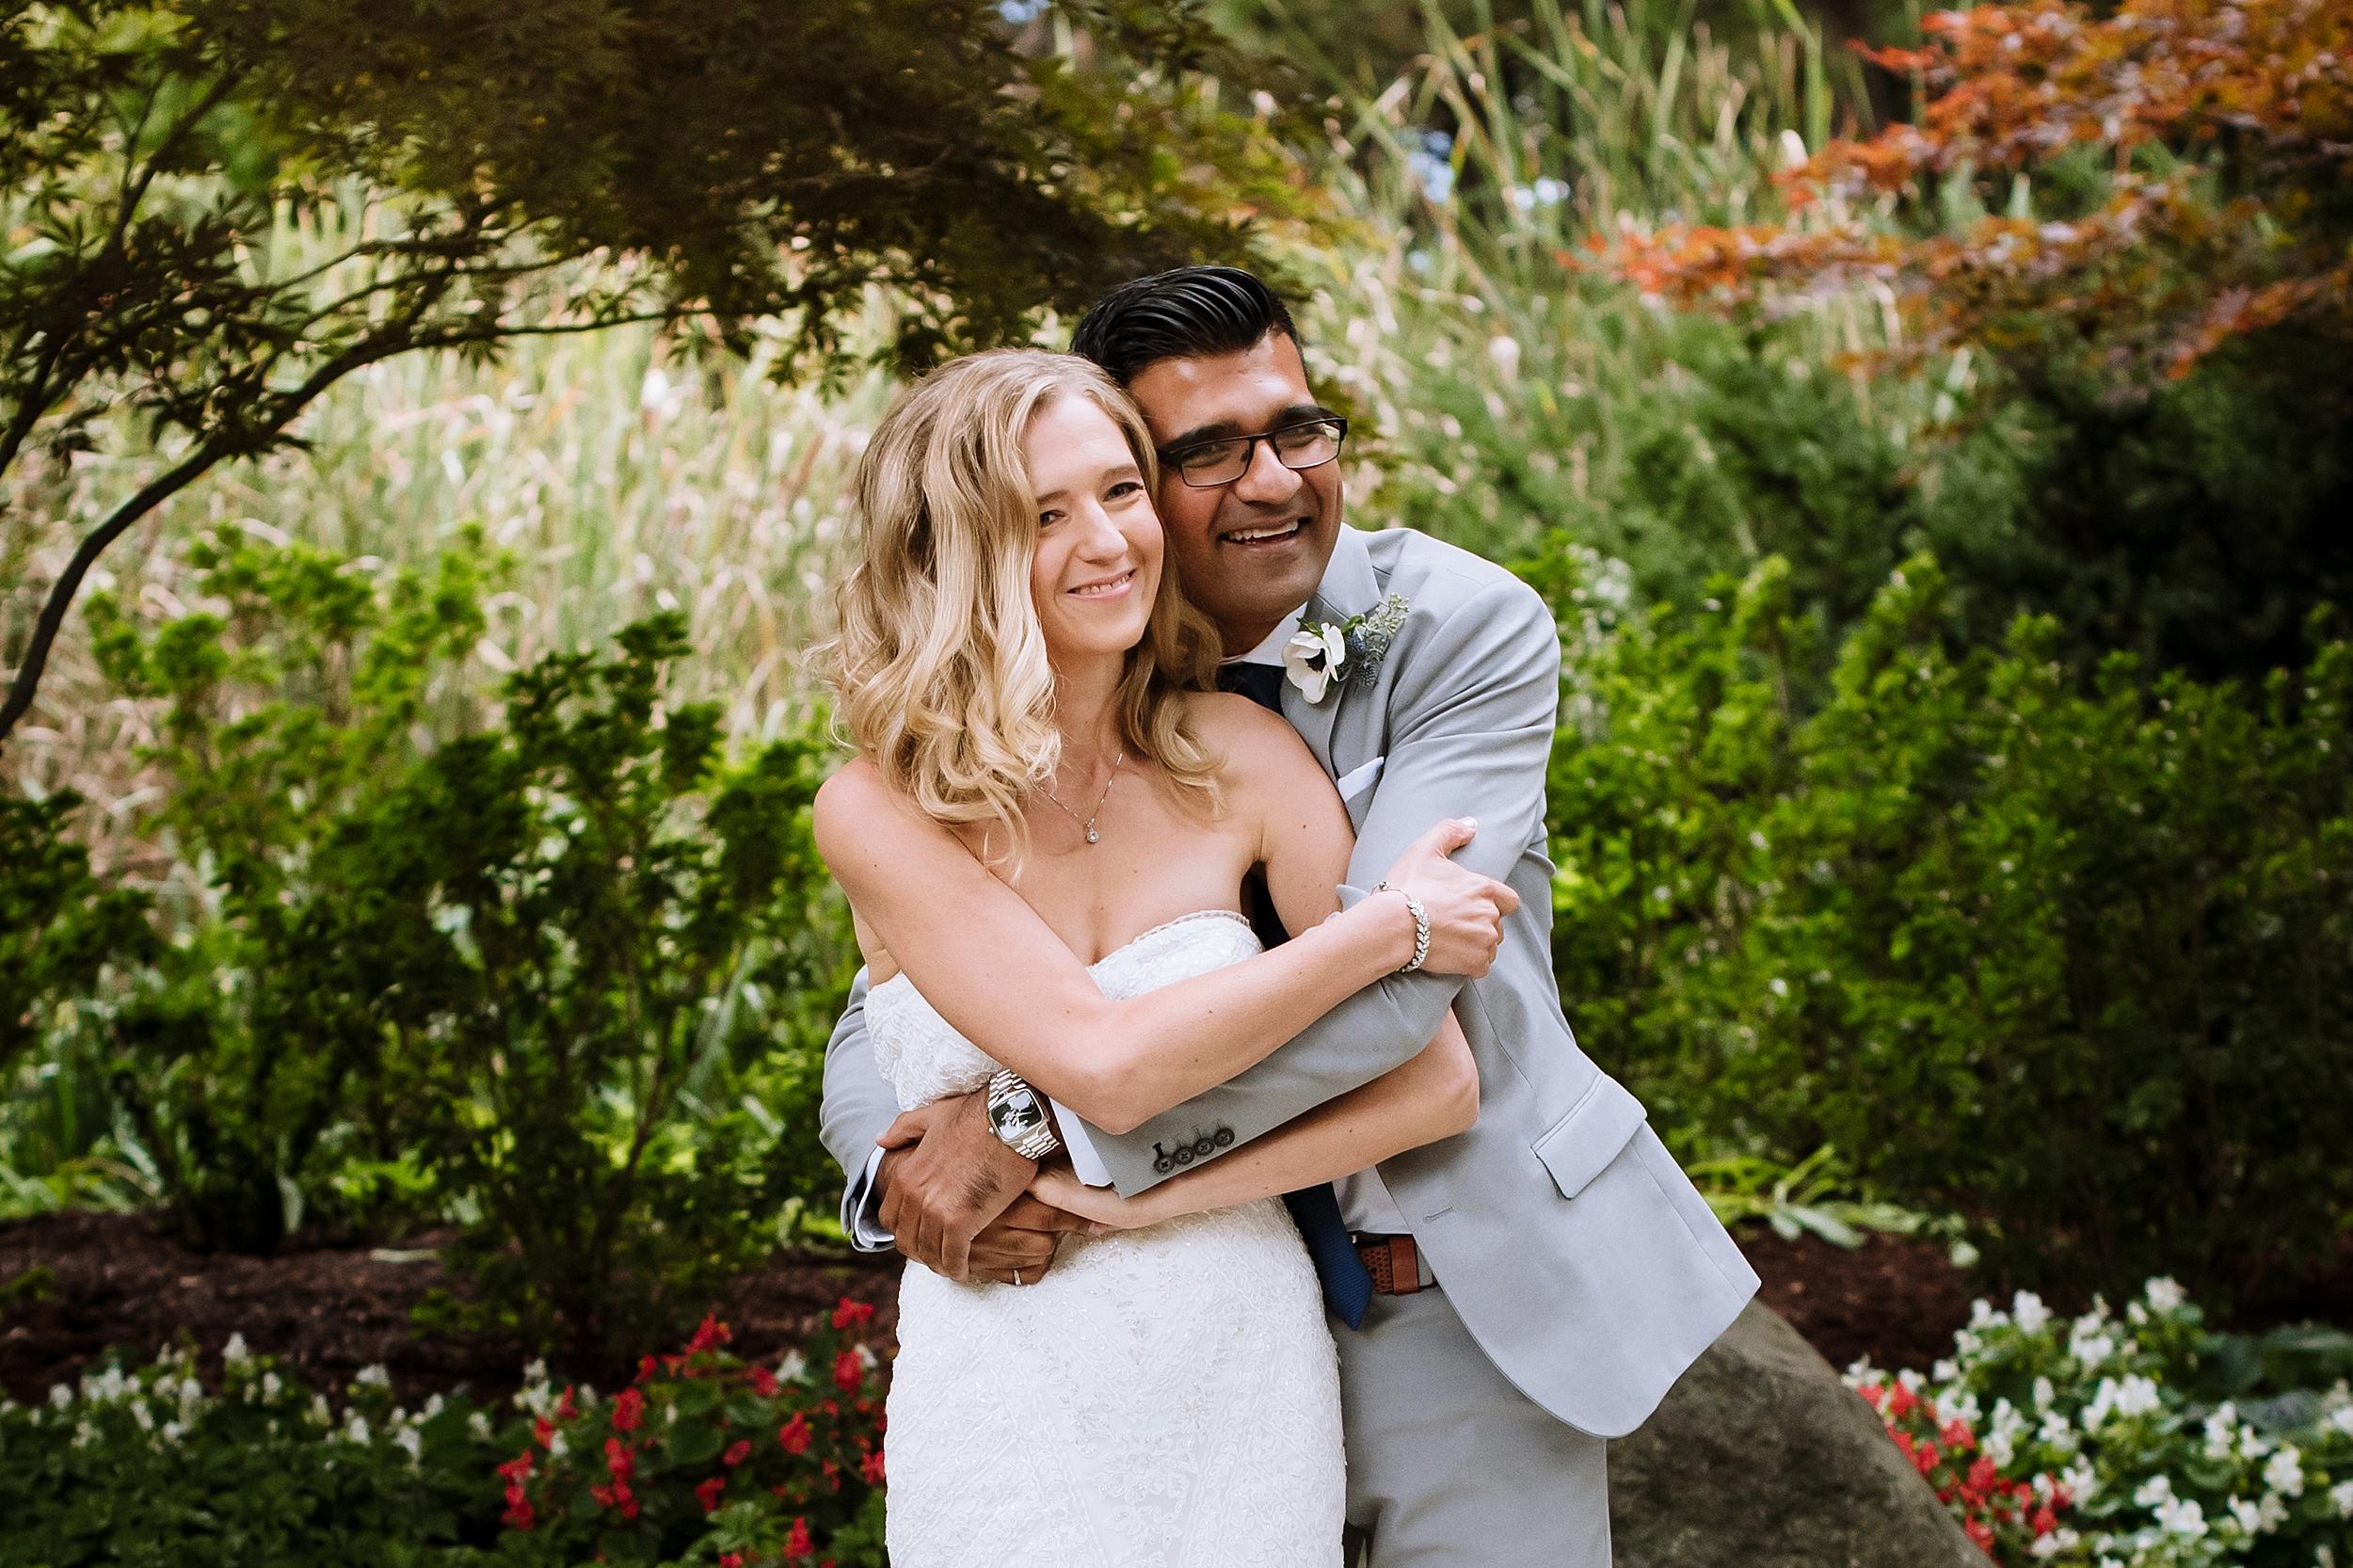 Kariya_Park_Wedding_Shoot_Toronto_Photographer_0040.jpg